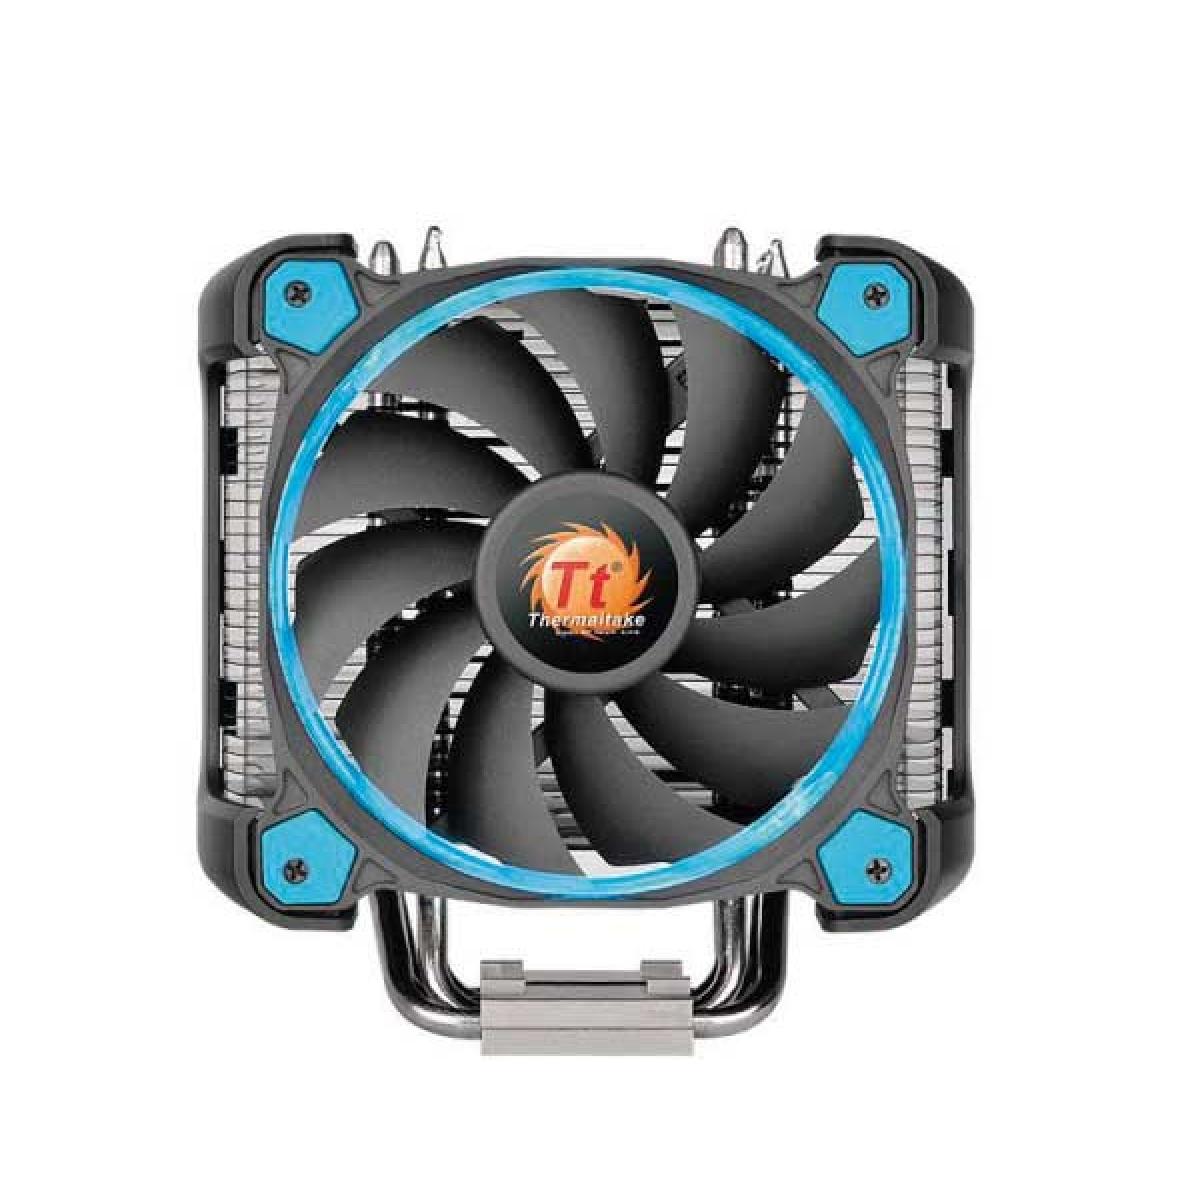 Cooler para Processador Thermaltake Riing SILENT 12 PRO, Blue 120mm, Intel-AMD, CL-P021-CA12BU-A